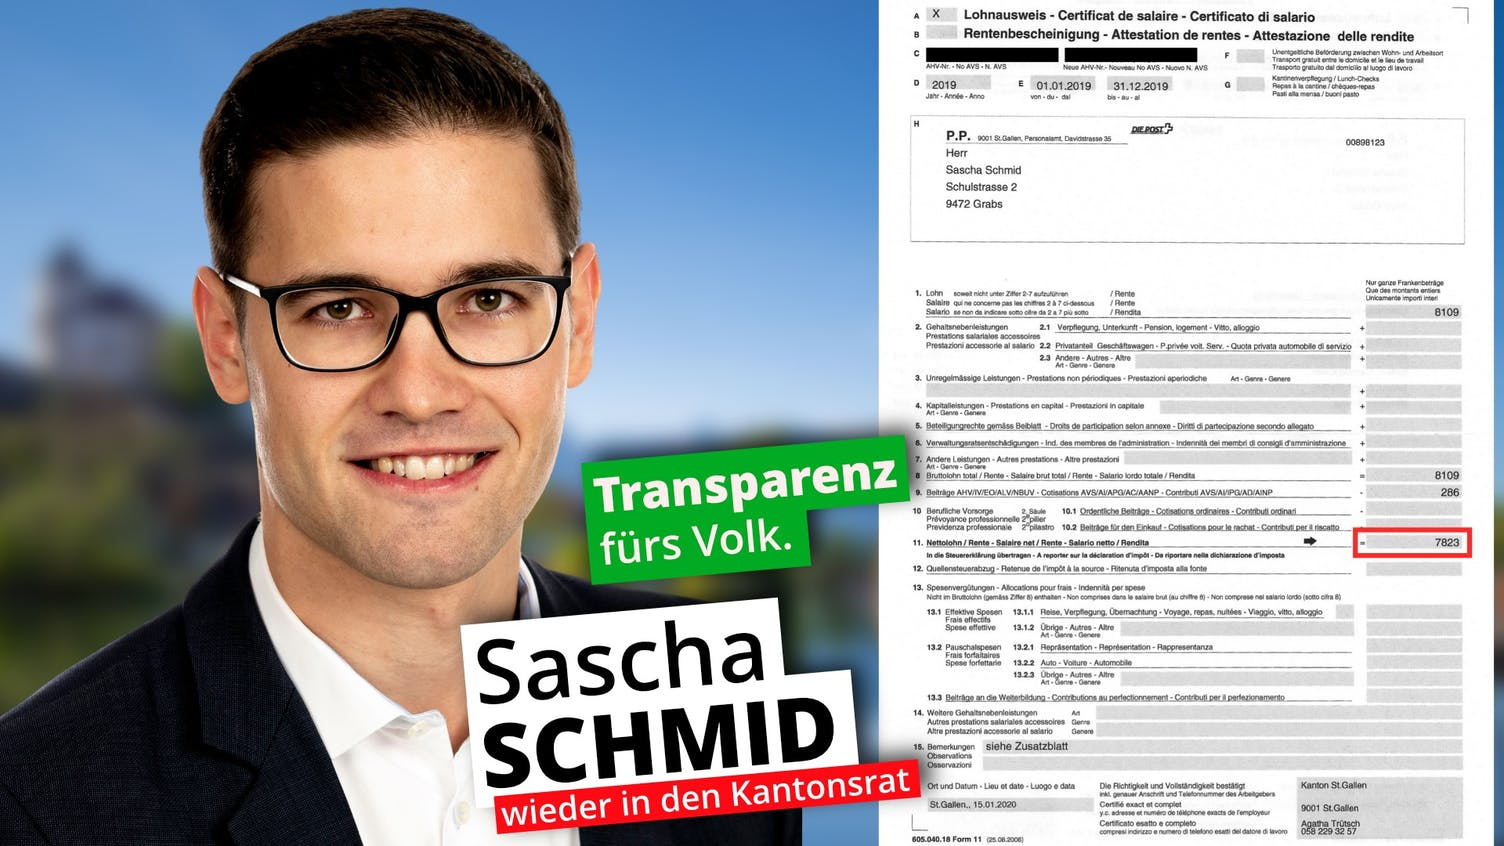 Sascha Schmid